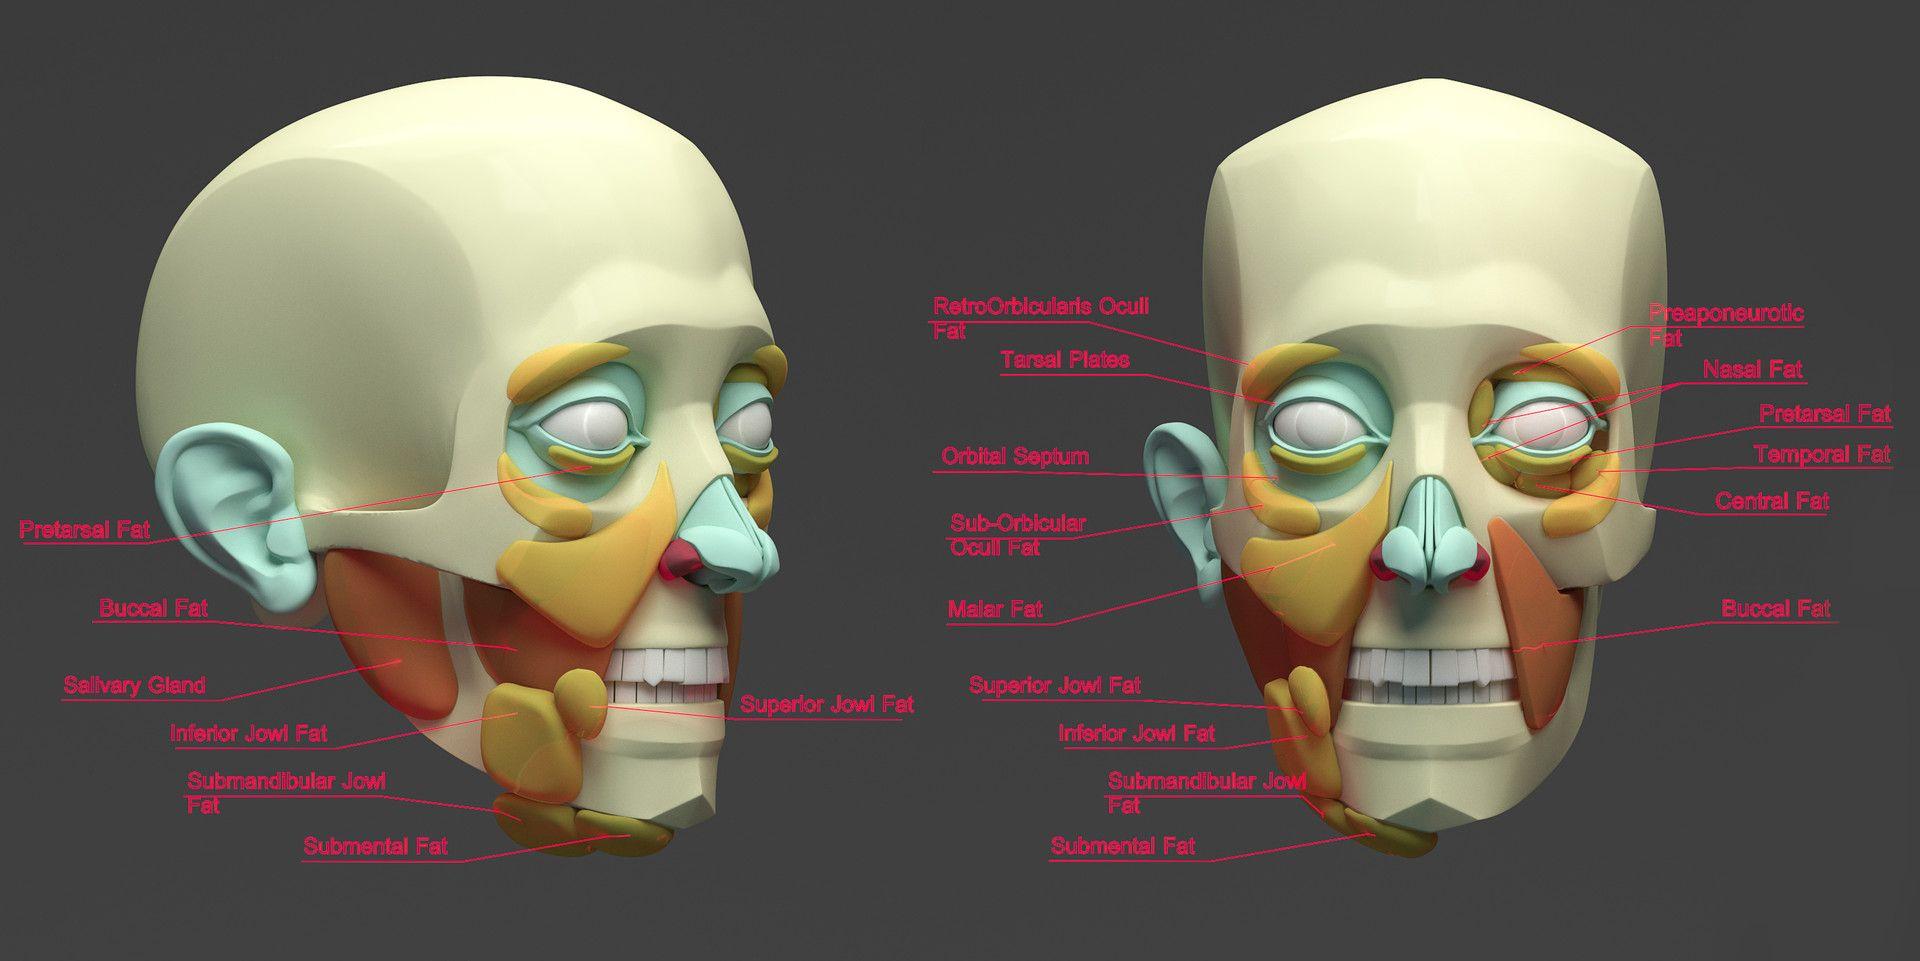 ArtStation - Face Fat Pads, Aleksandrs K   Anatomy - Human ...